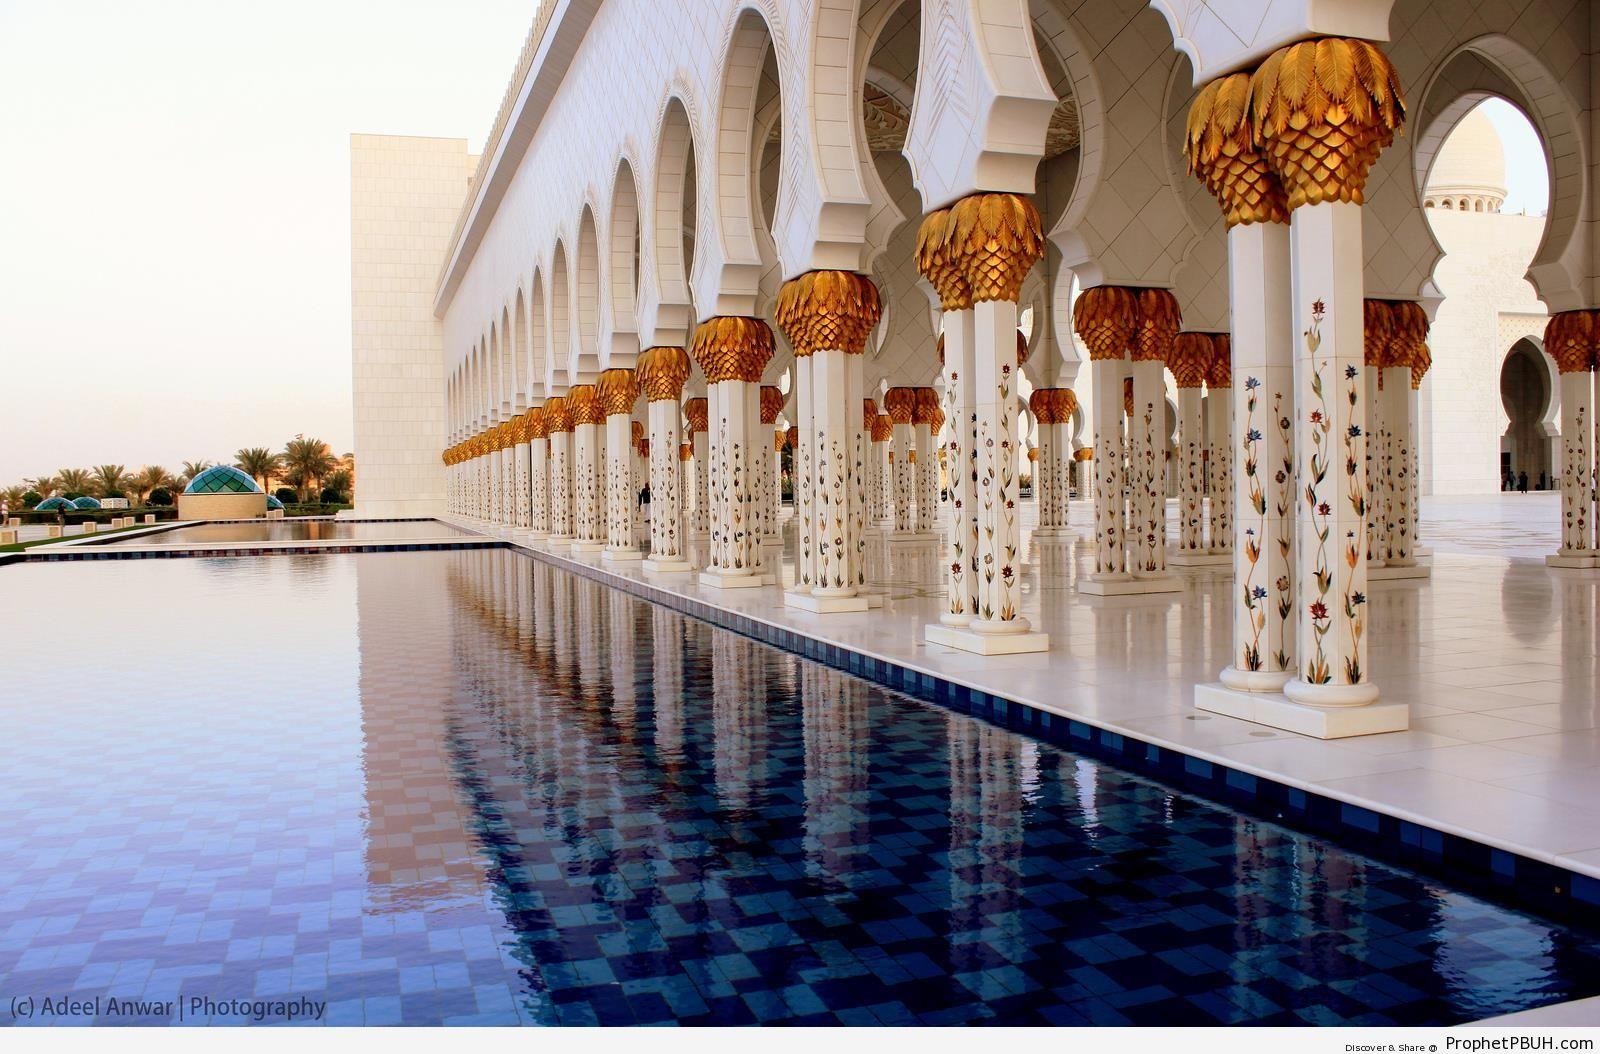 Islamic Architecture at Sheikh Zayed Grand Mosque in Abu Dhabi - Abu Dhabi, United Arab Emirates -Picture